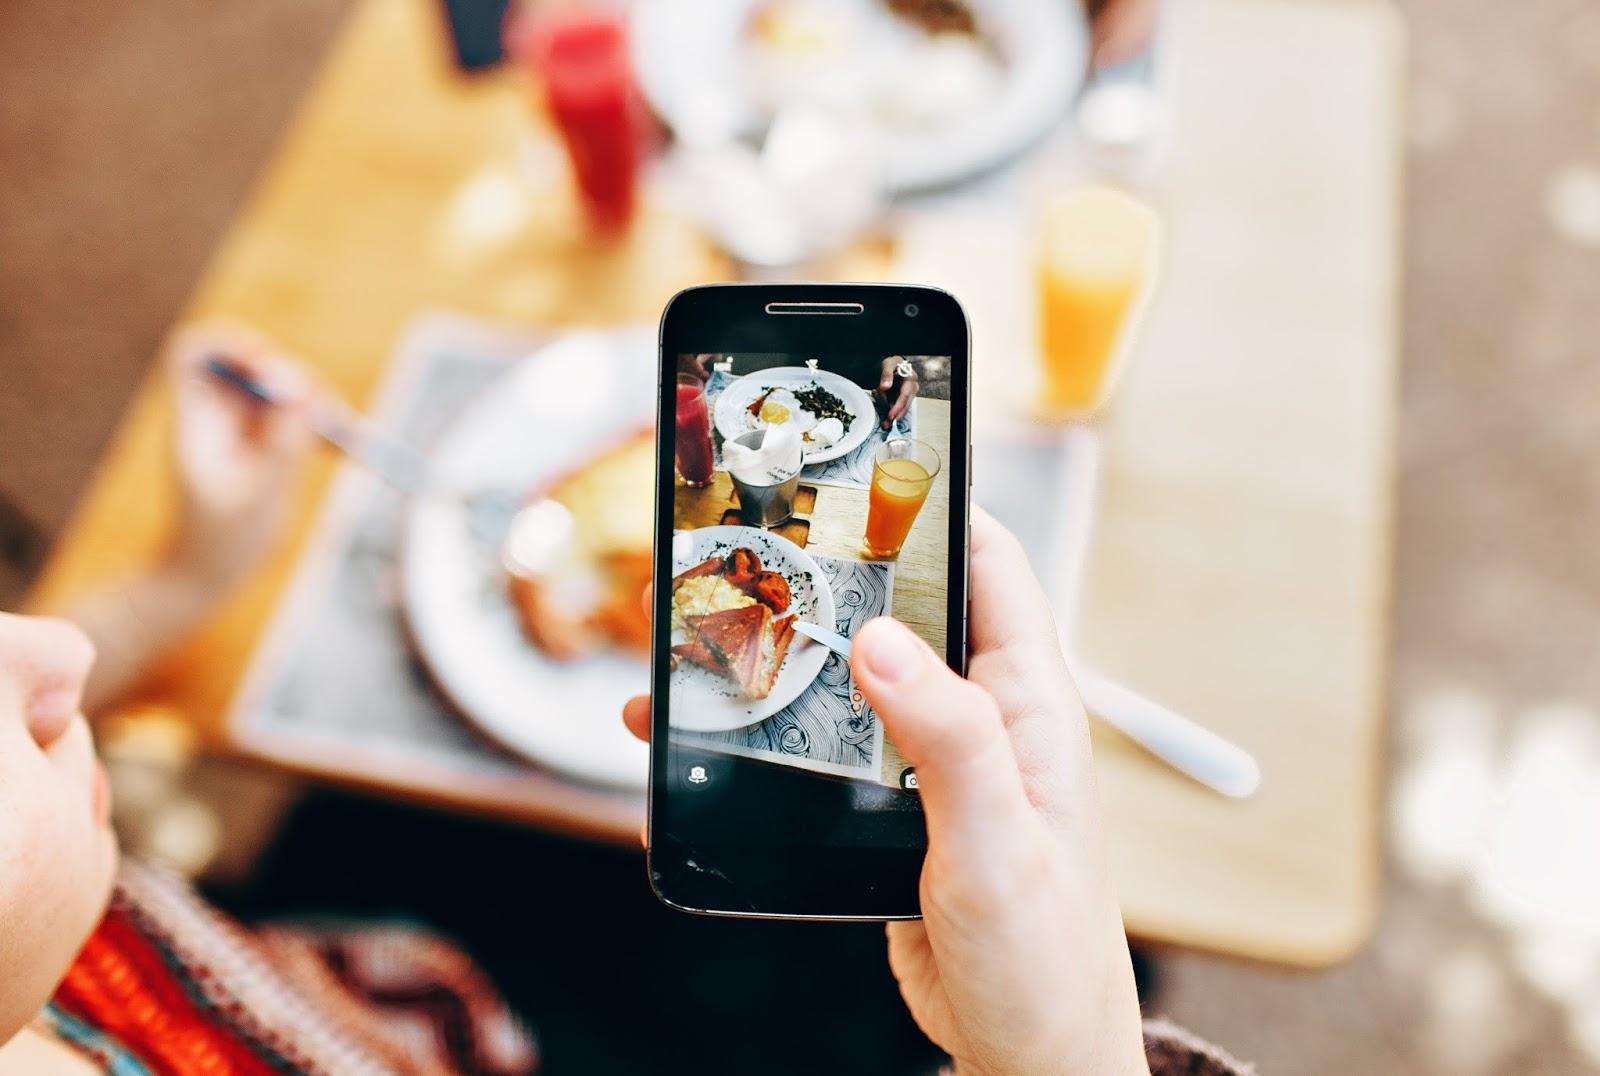 Hanya 3 Tips Untuk Meningkatkan Followers Instagram !!!